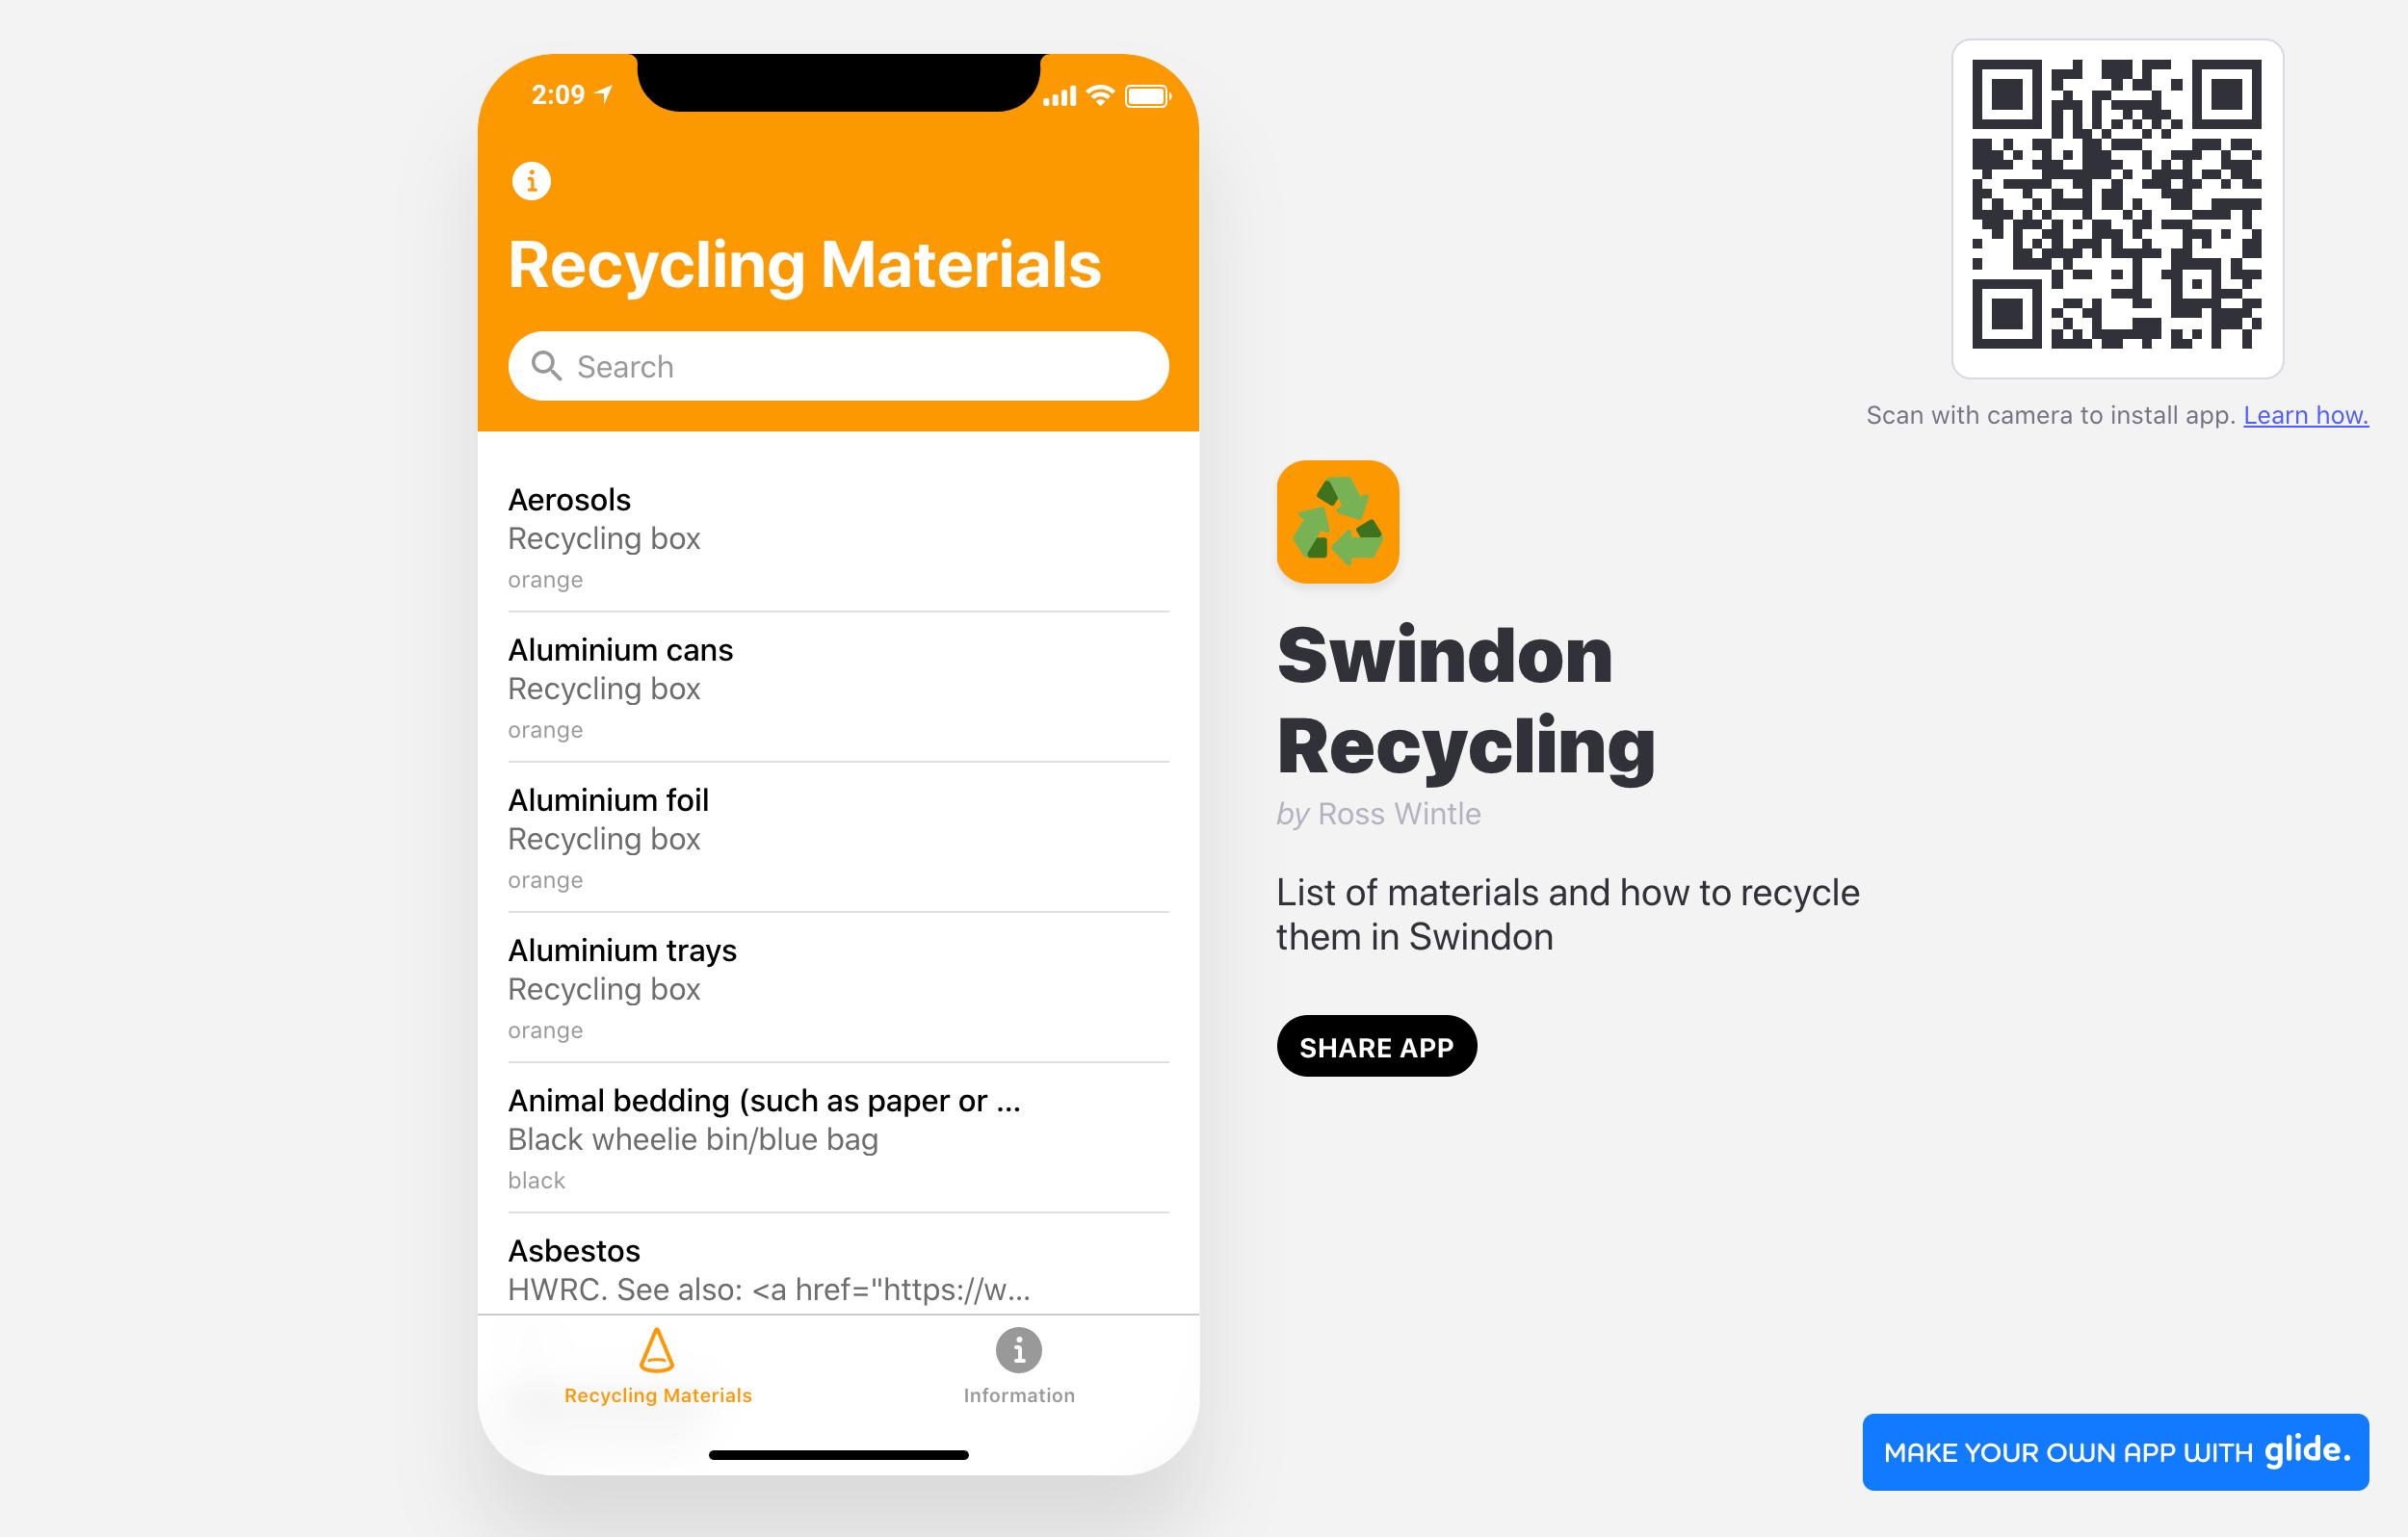 Swindon Recycling